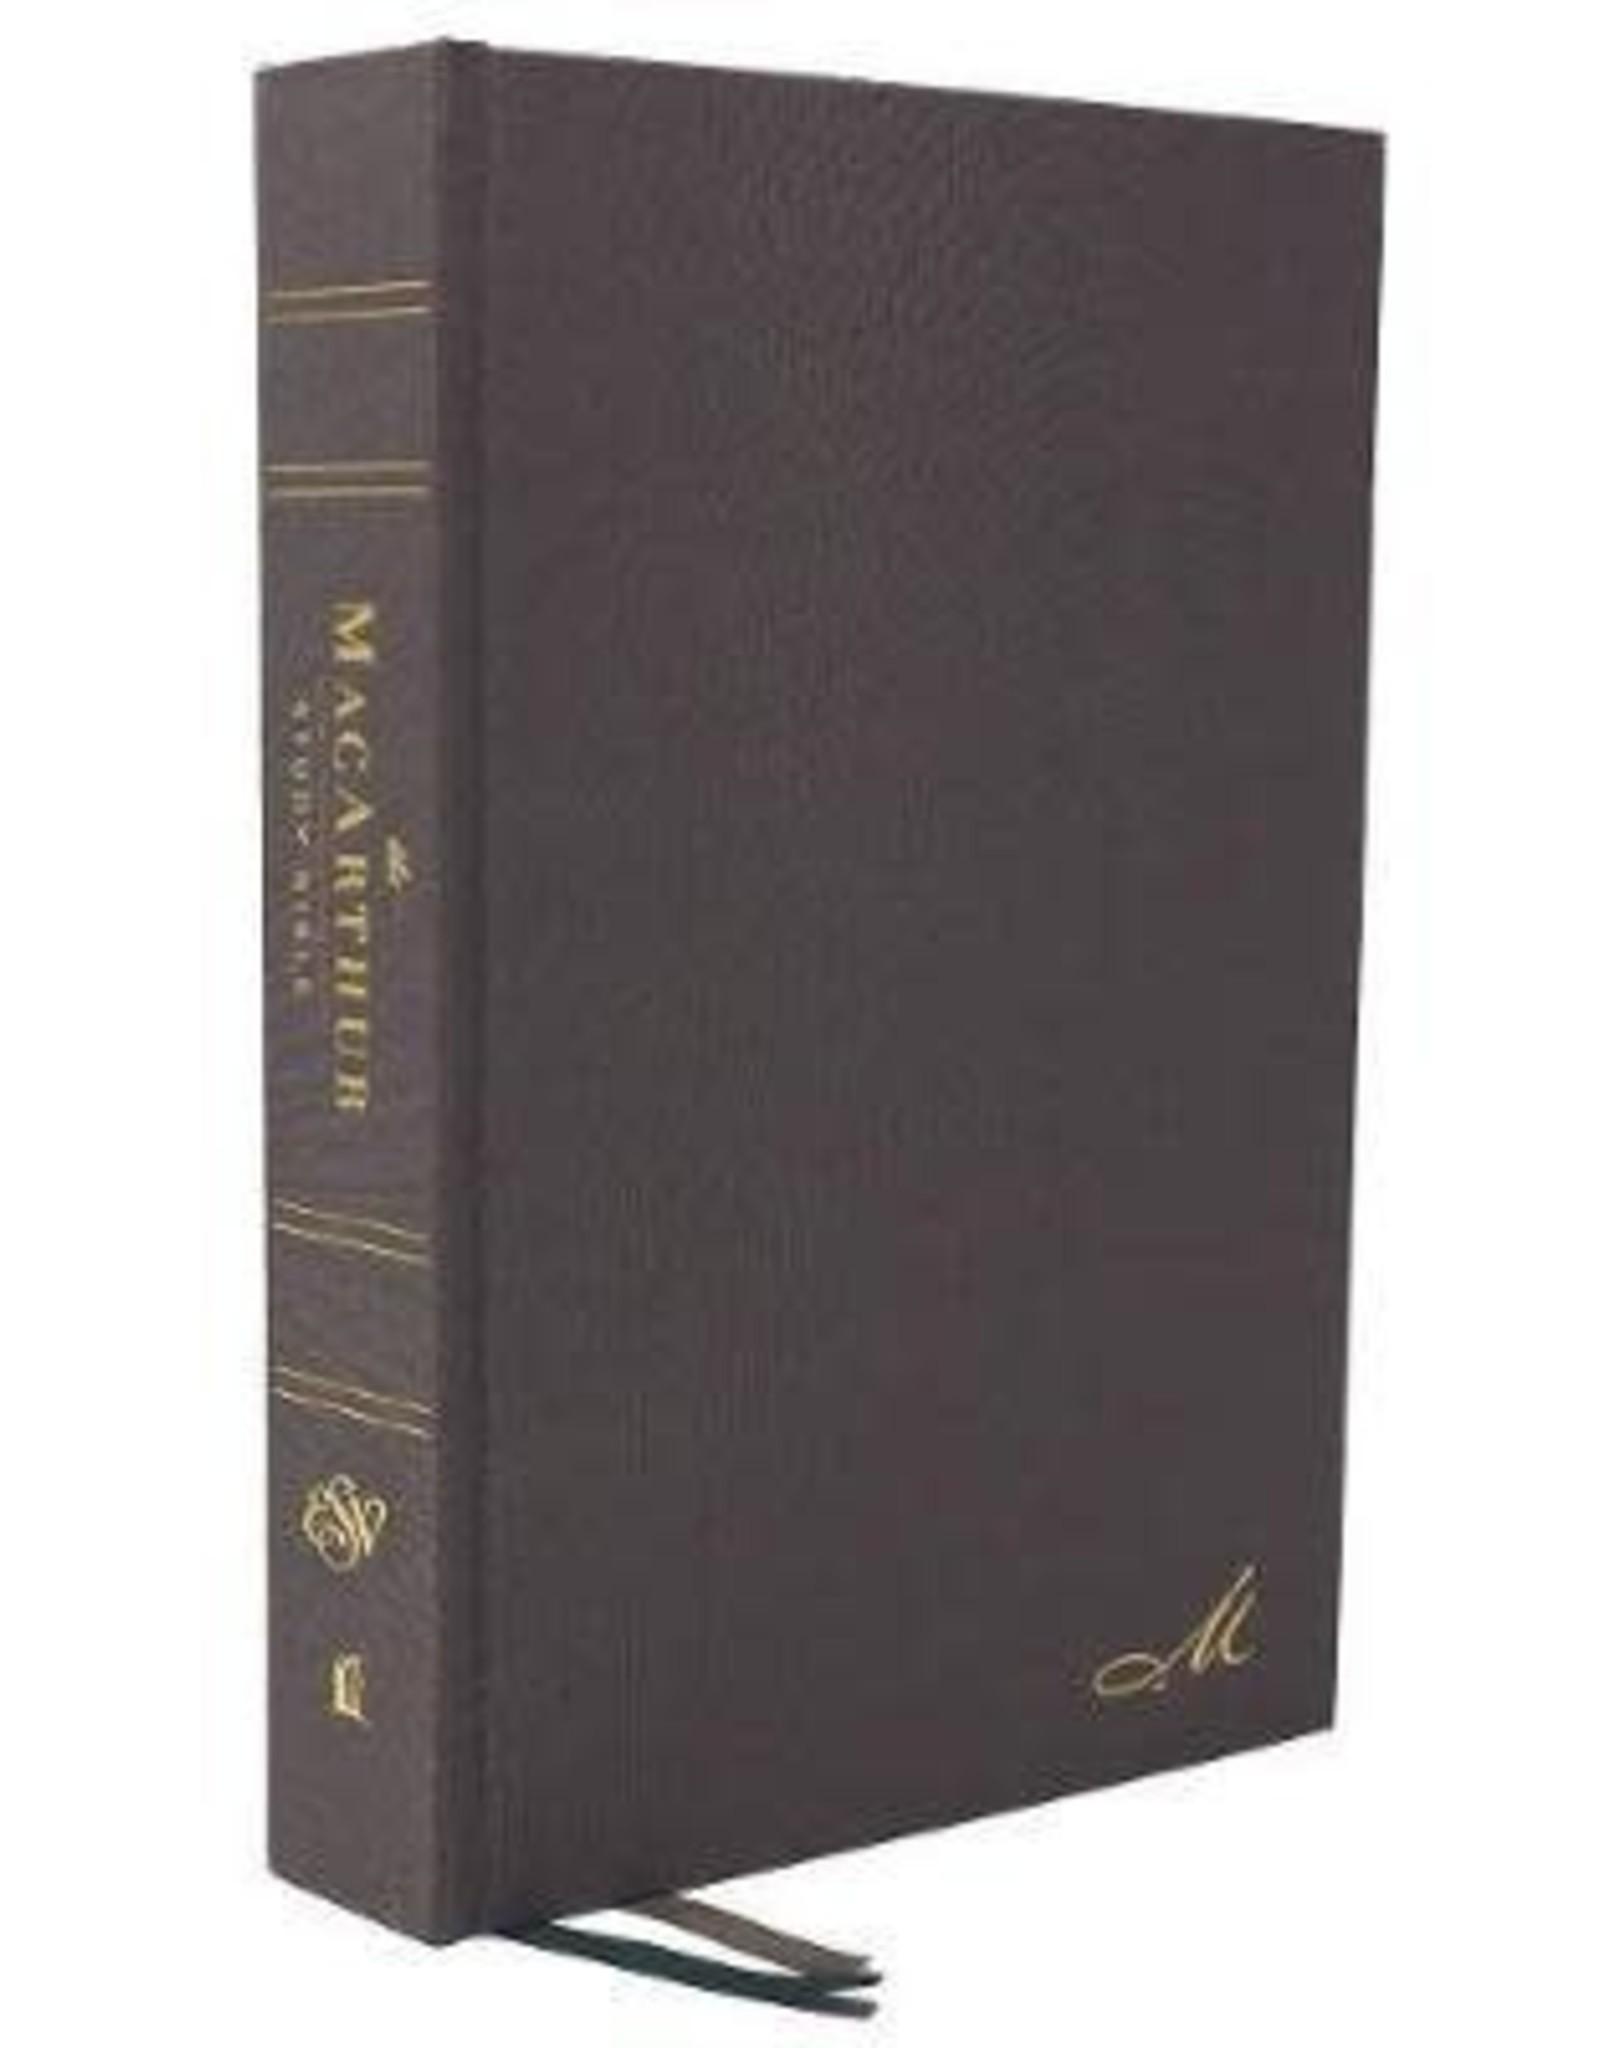 ESV MacArthur Study Bible Second Edition Gray Cloth over Board